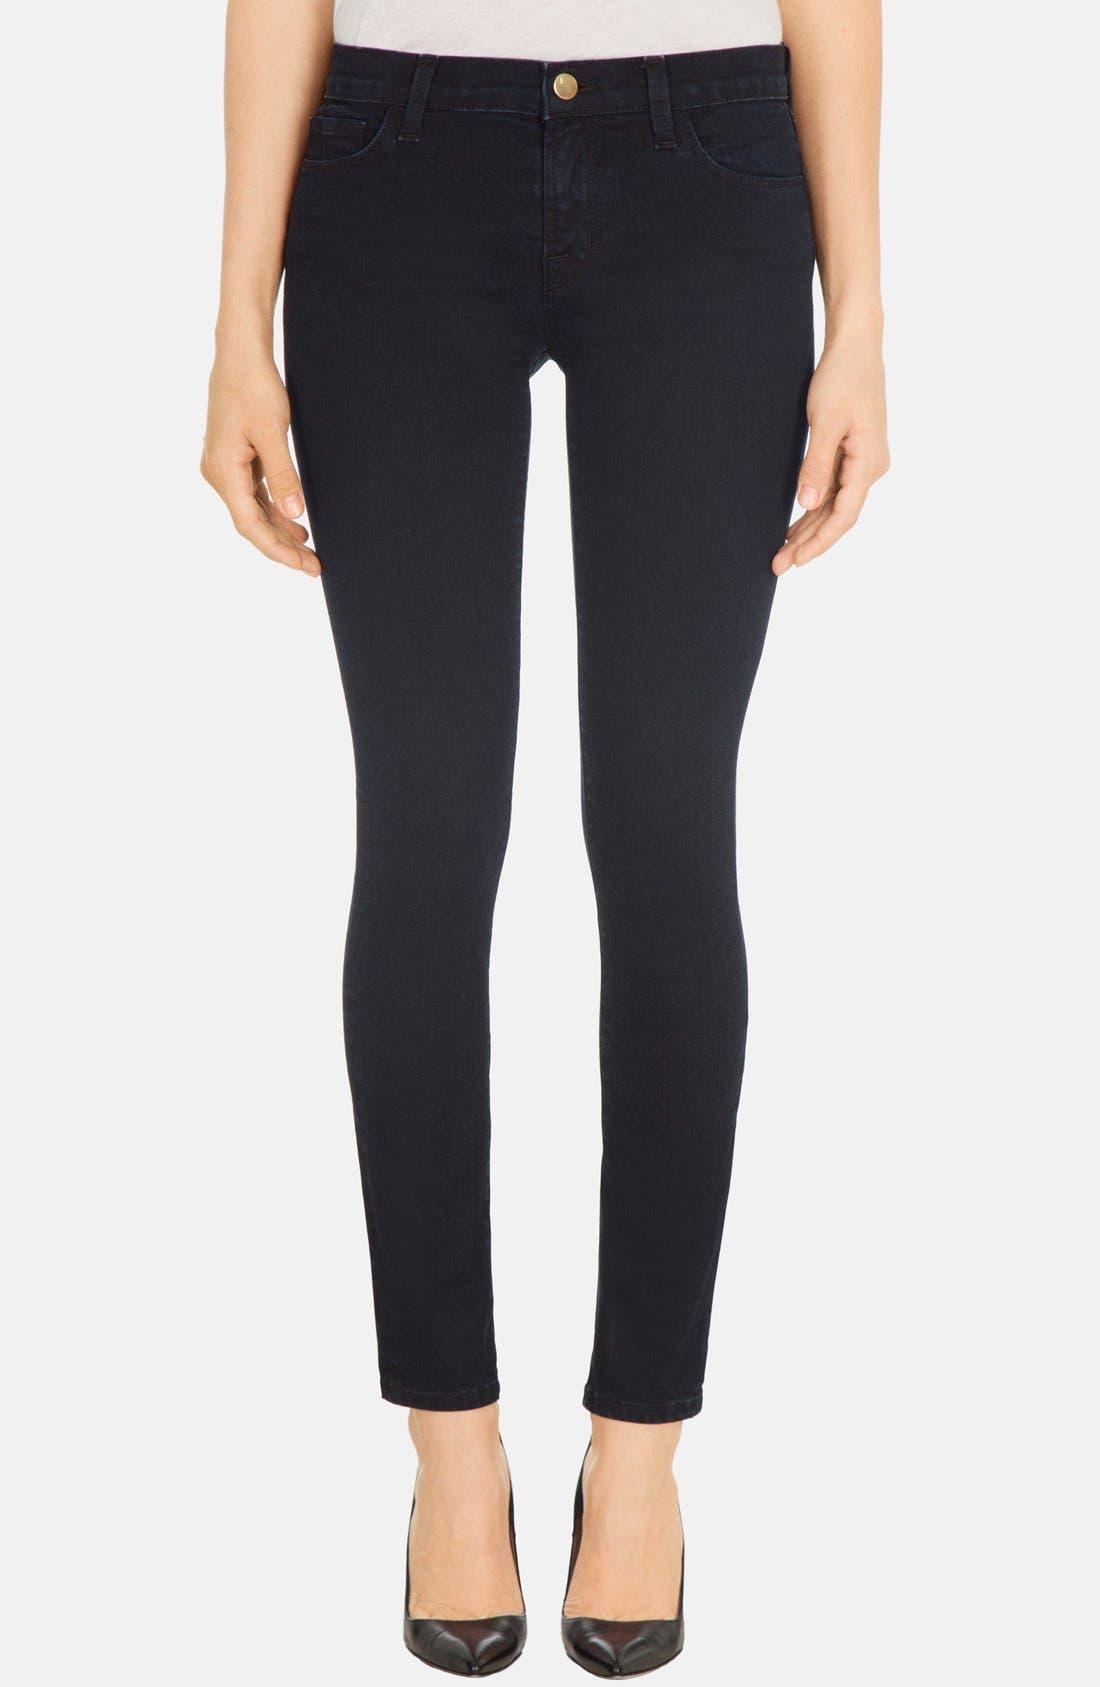 Alternate Image 1 Selected - J Brand Skinny Stretch Denim Jeans (Blue Bird)